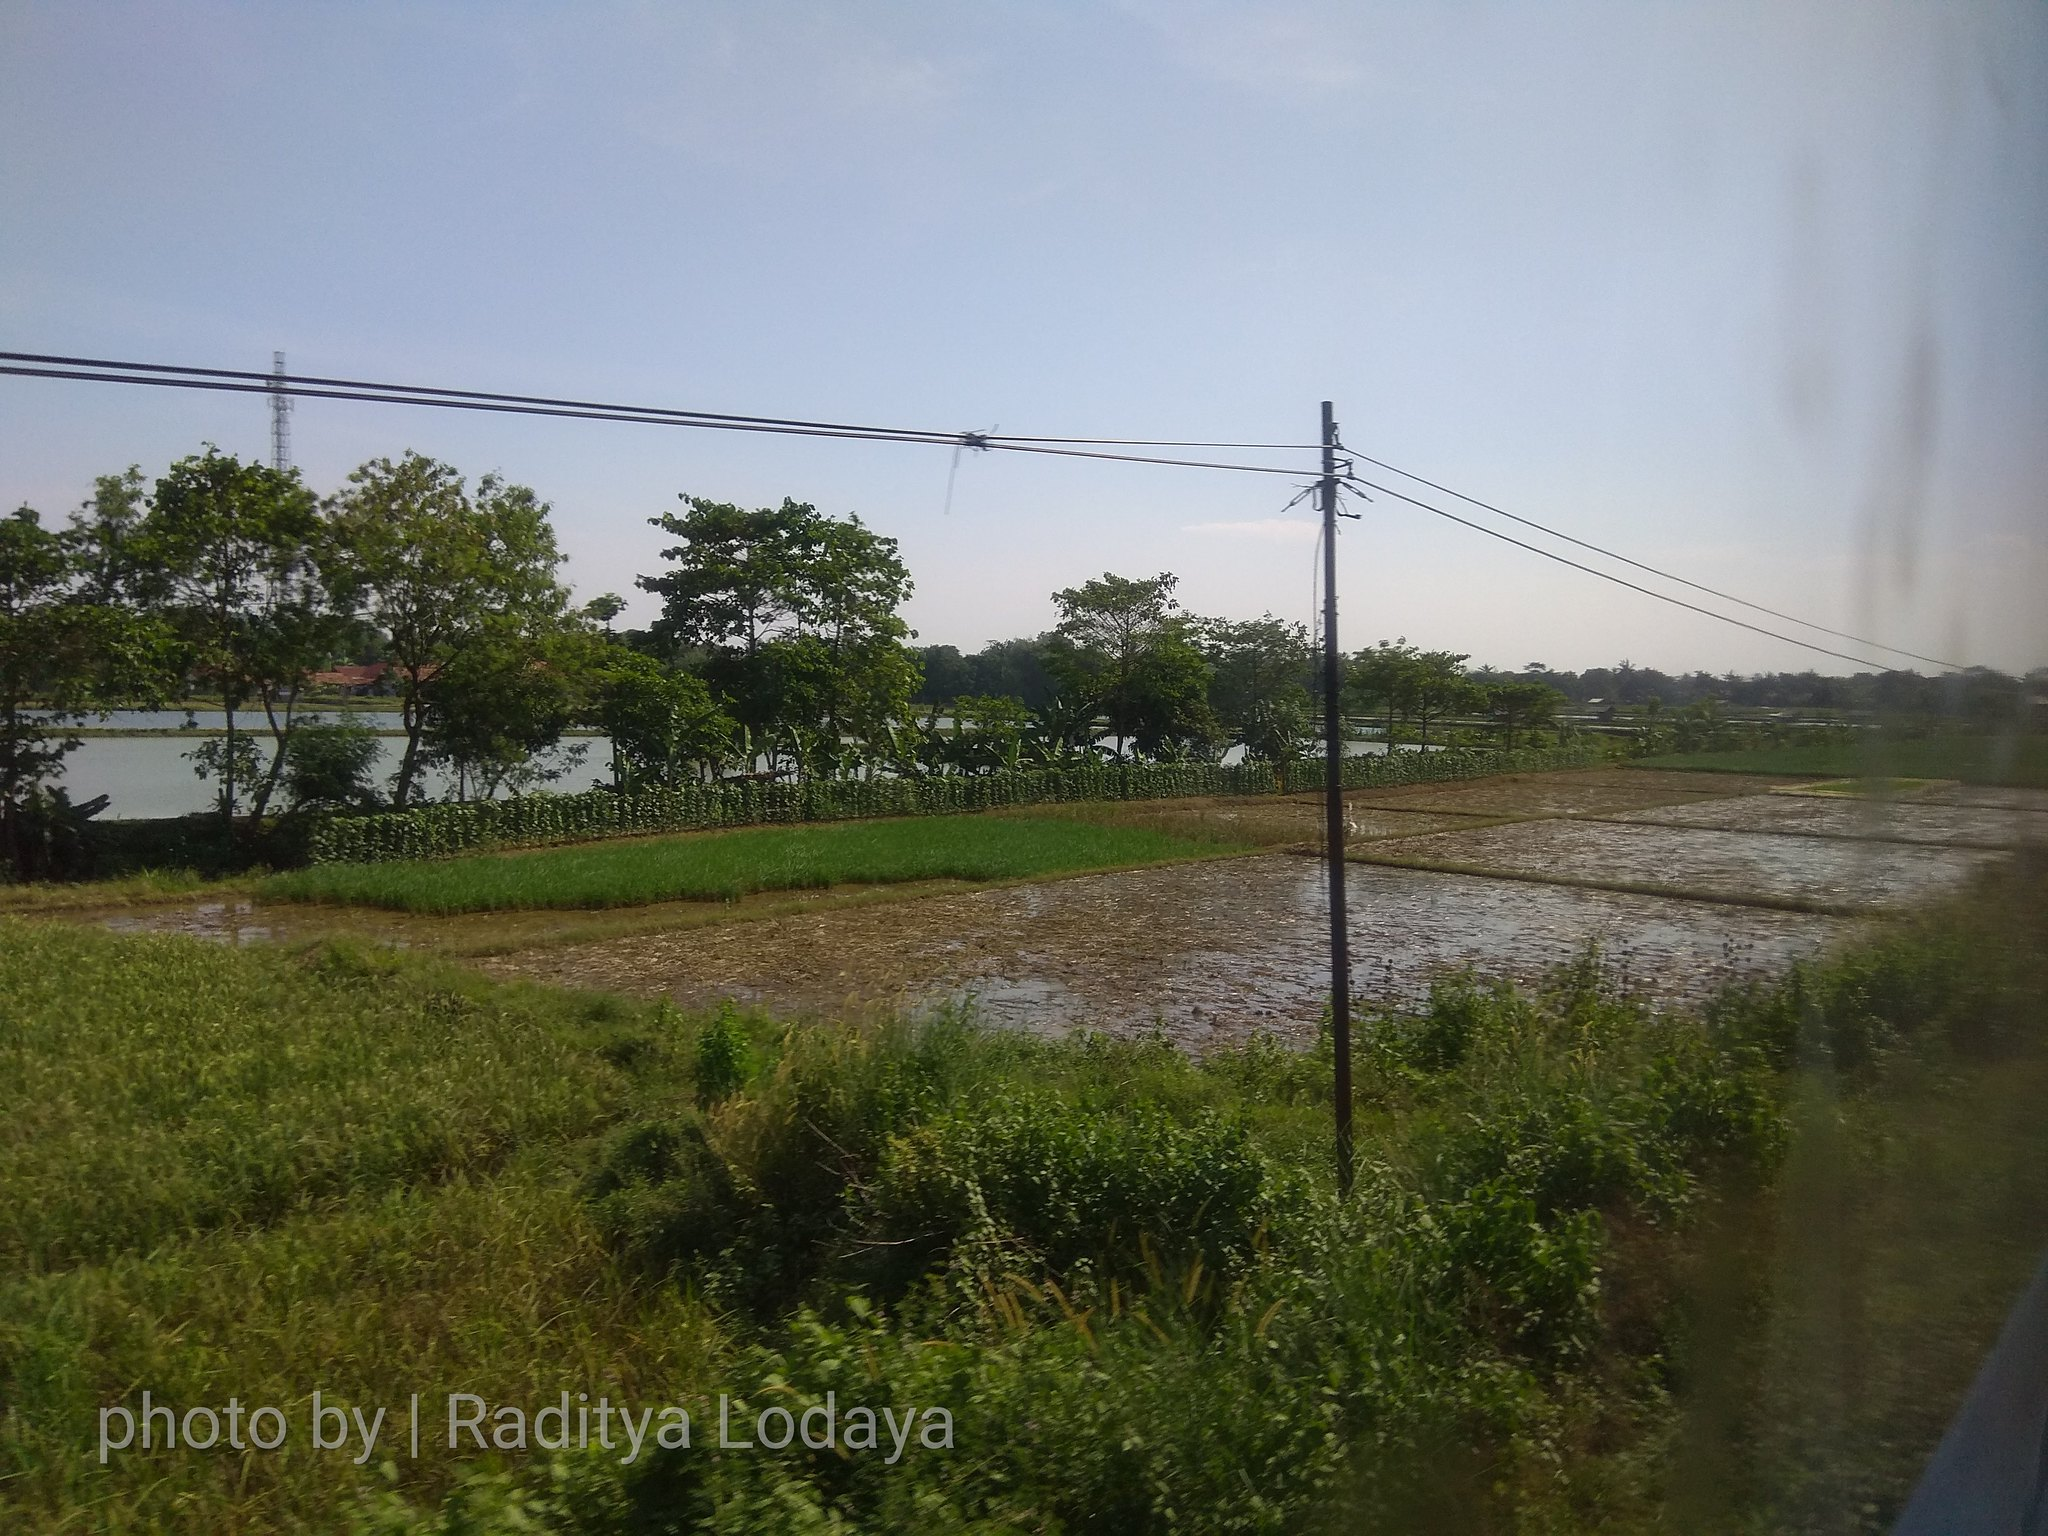 11 TRIP REPORT KERETA API JAYABAYA 1 (JAKARTA-CIREBON) -- KABUPATEN SUBANG 3